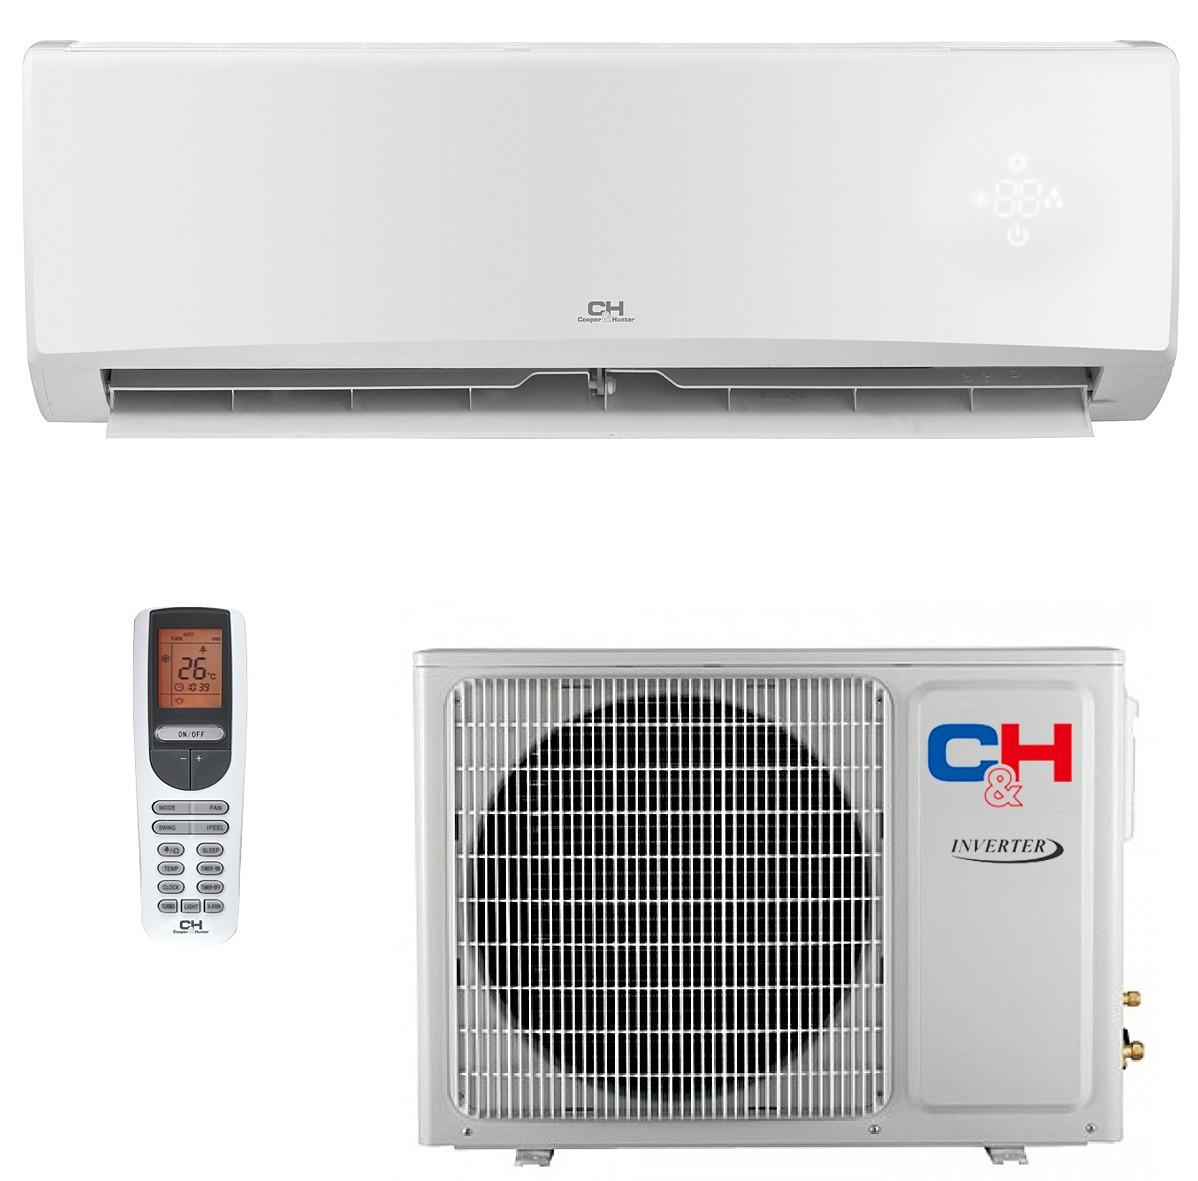 Кондиционер инверторный сплит-система Cooper&Hunter Alpha Inverter CH-S09FTXE-NG R32 Wi-Fi